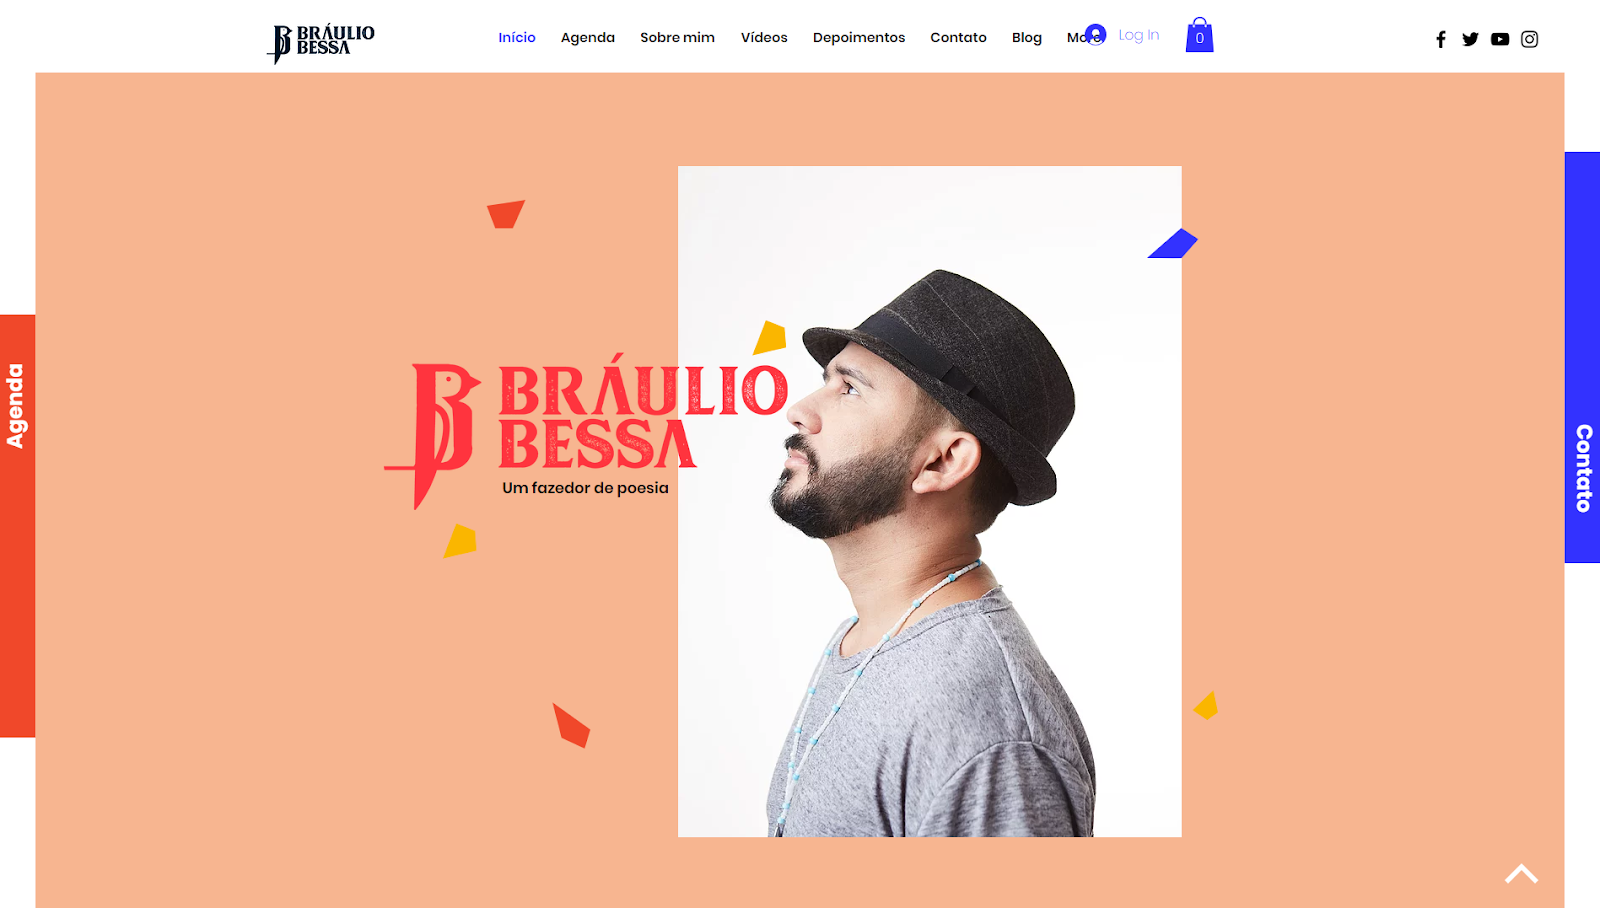 Site do escritor Bráulio Bessa